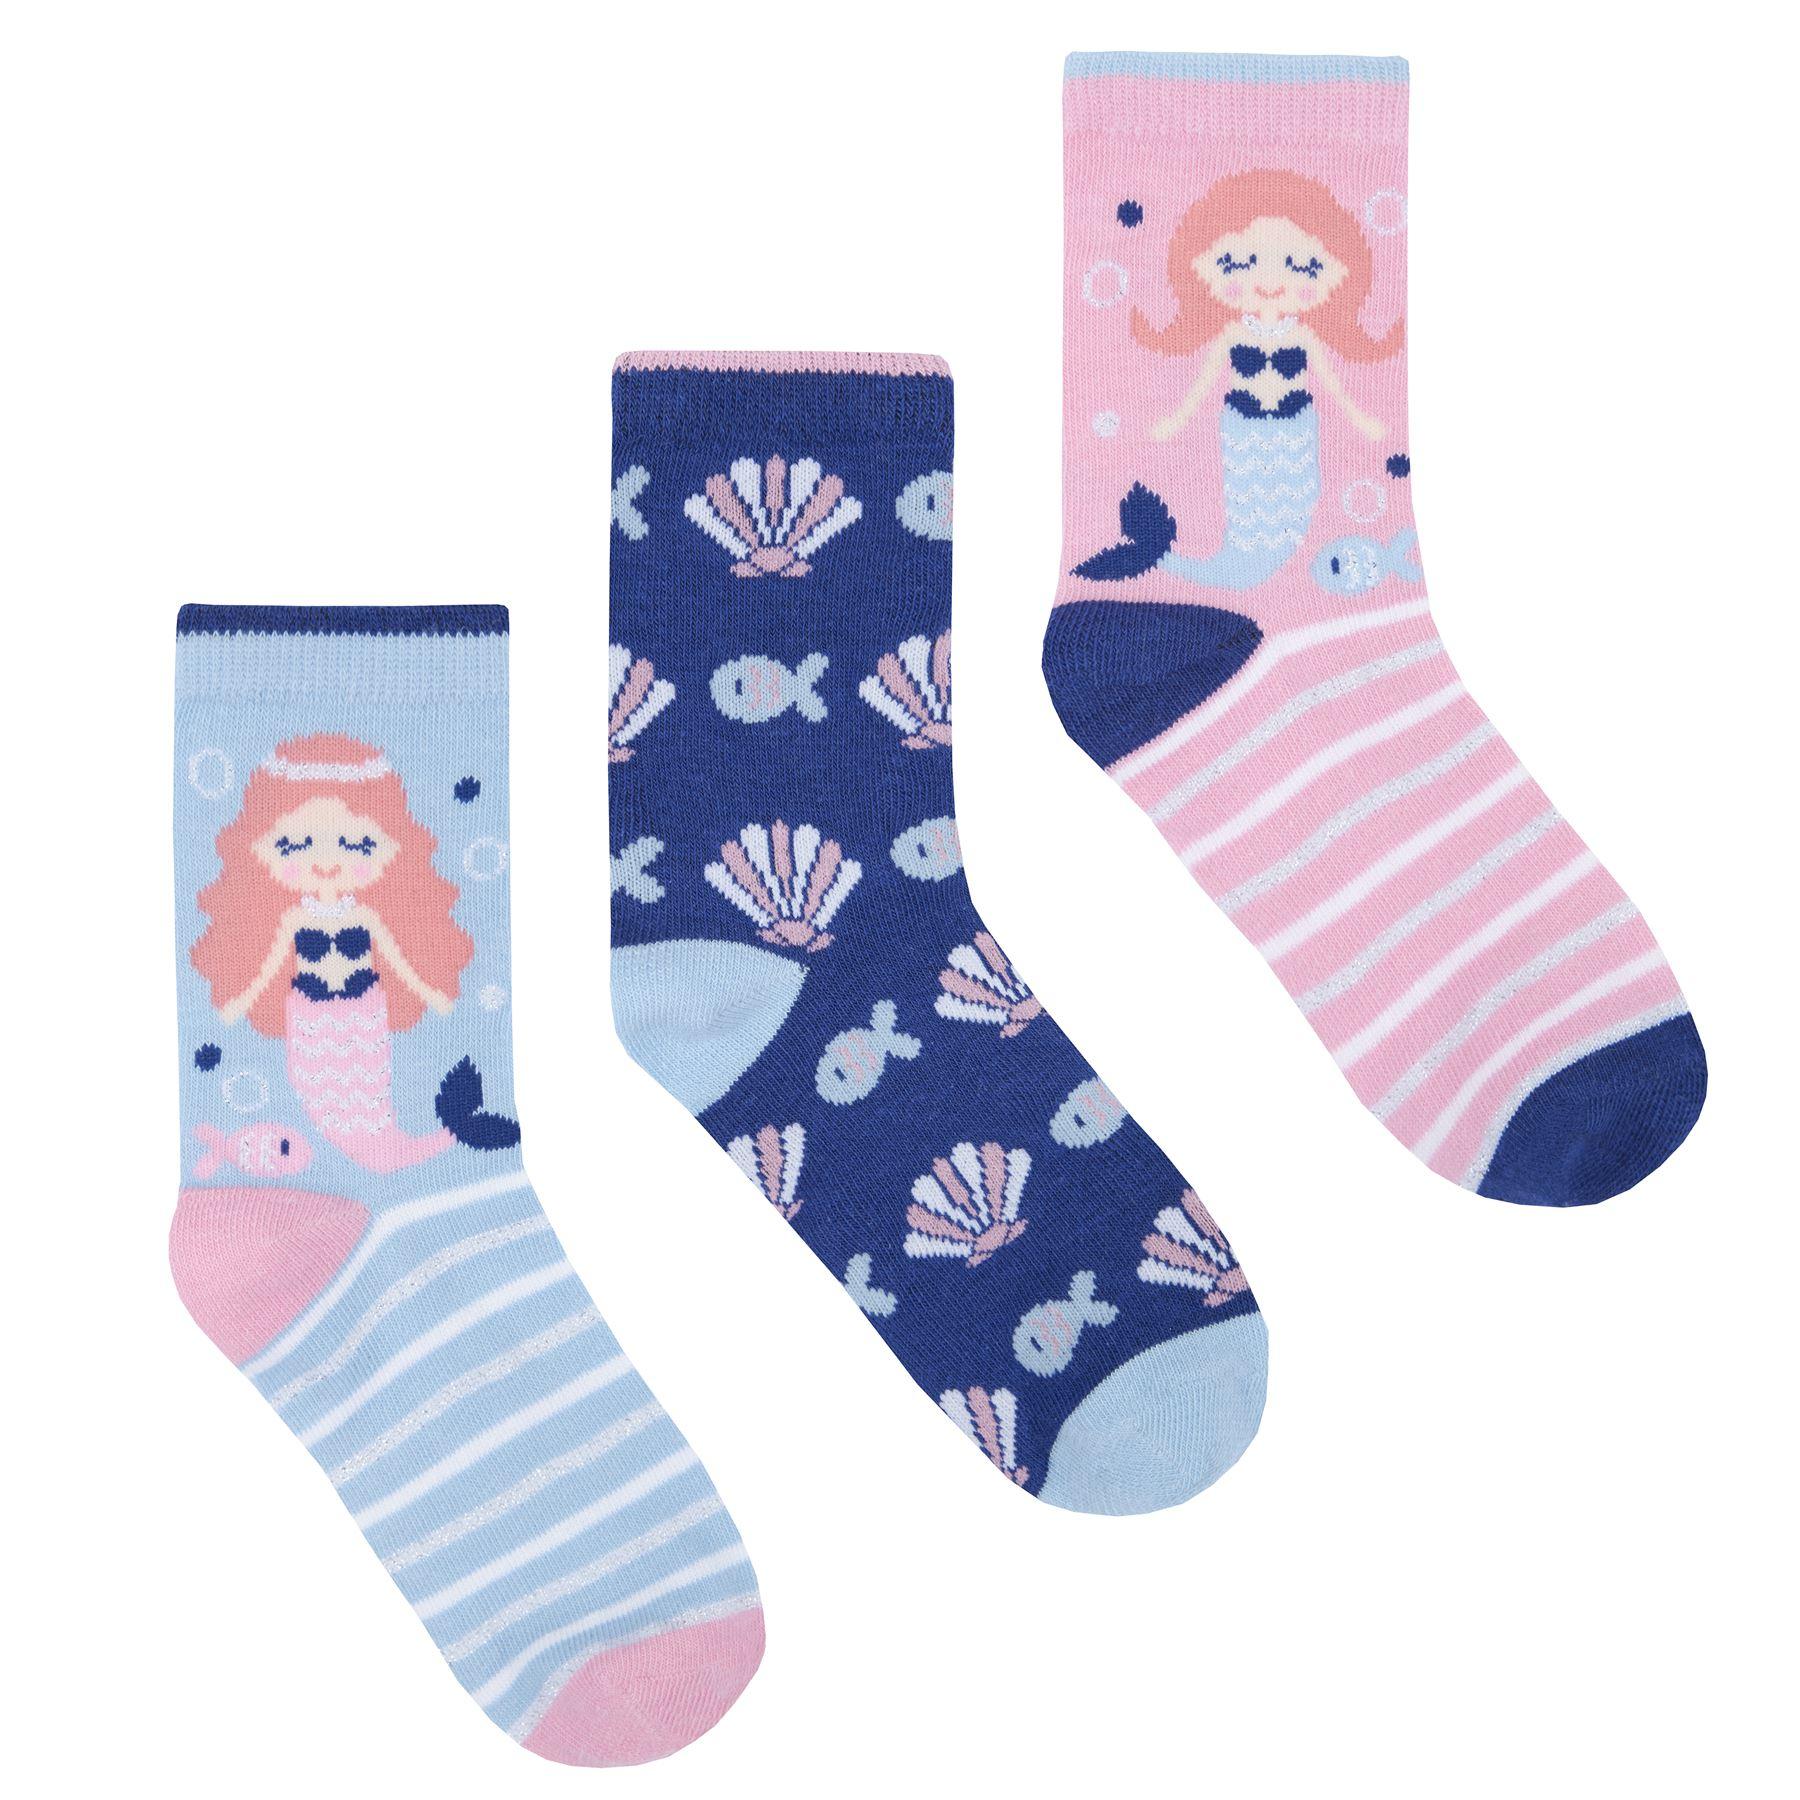 Kids Cotton Unicorn Mermaid Pug Socks Pack Of 6 Girls Design Socks